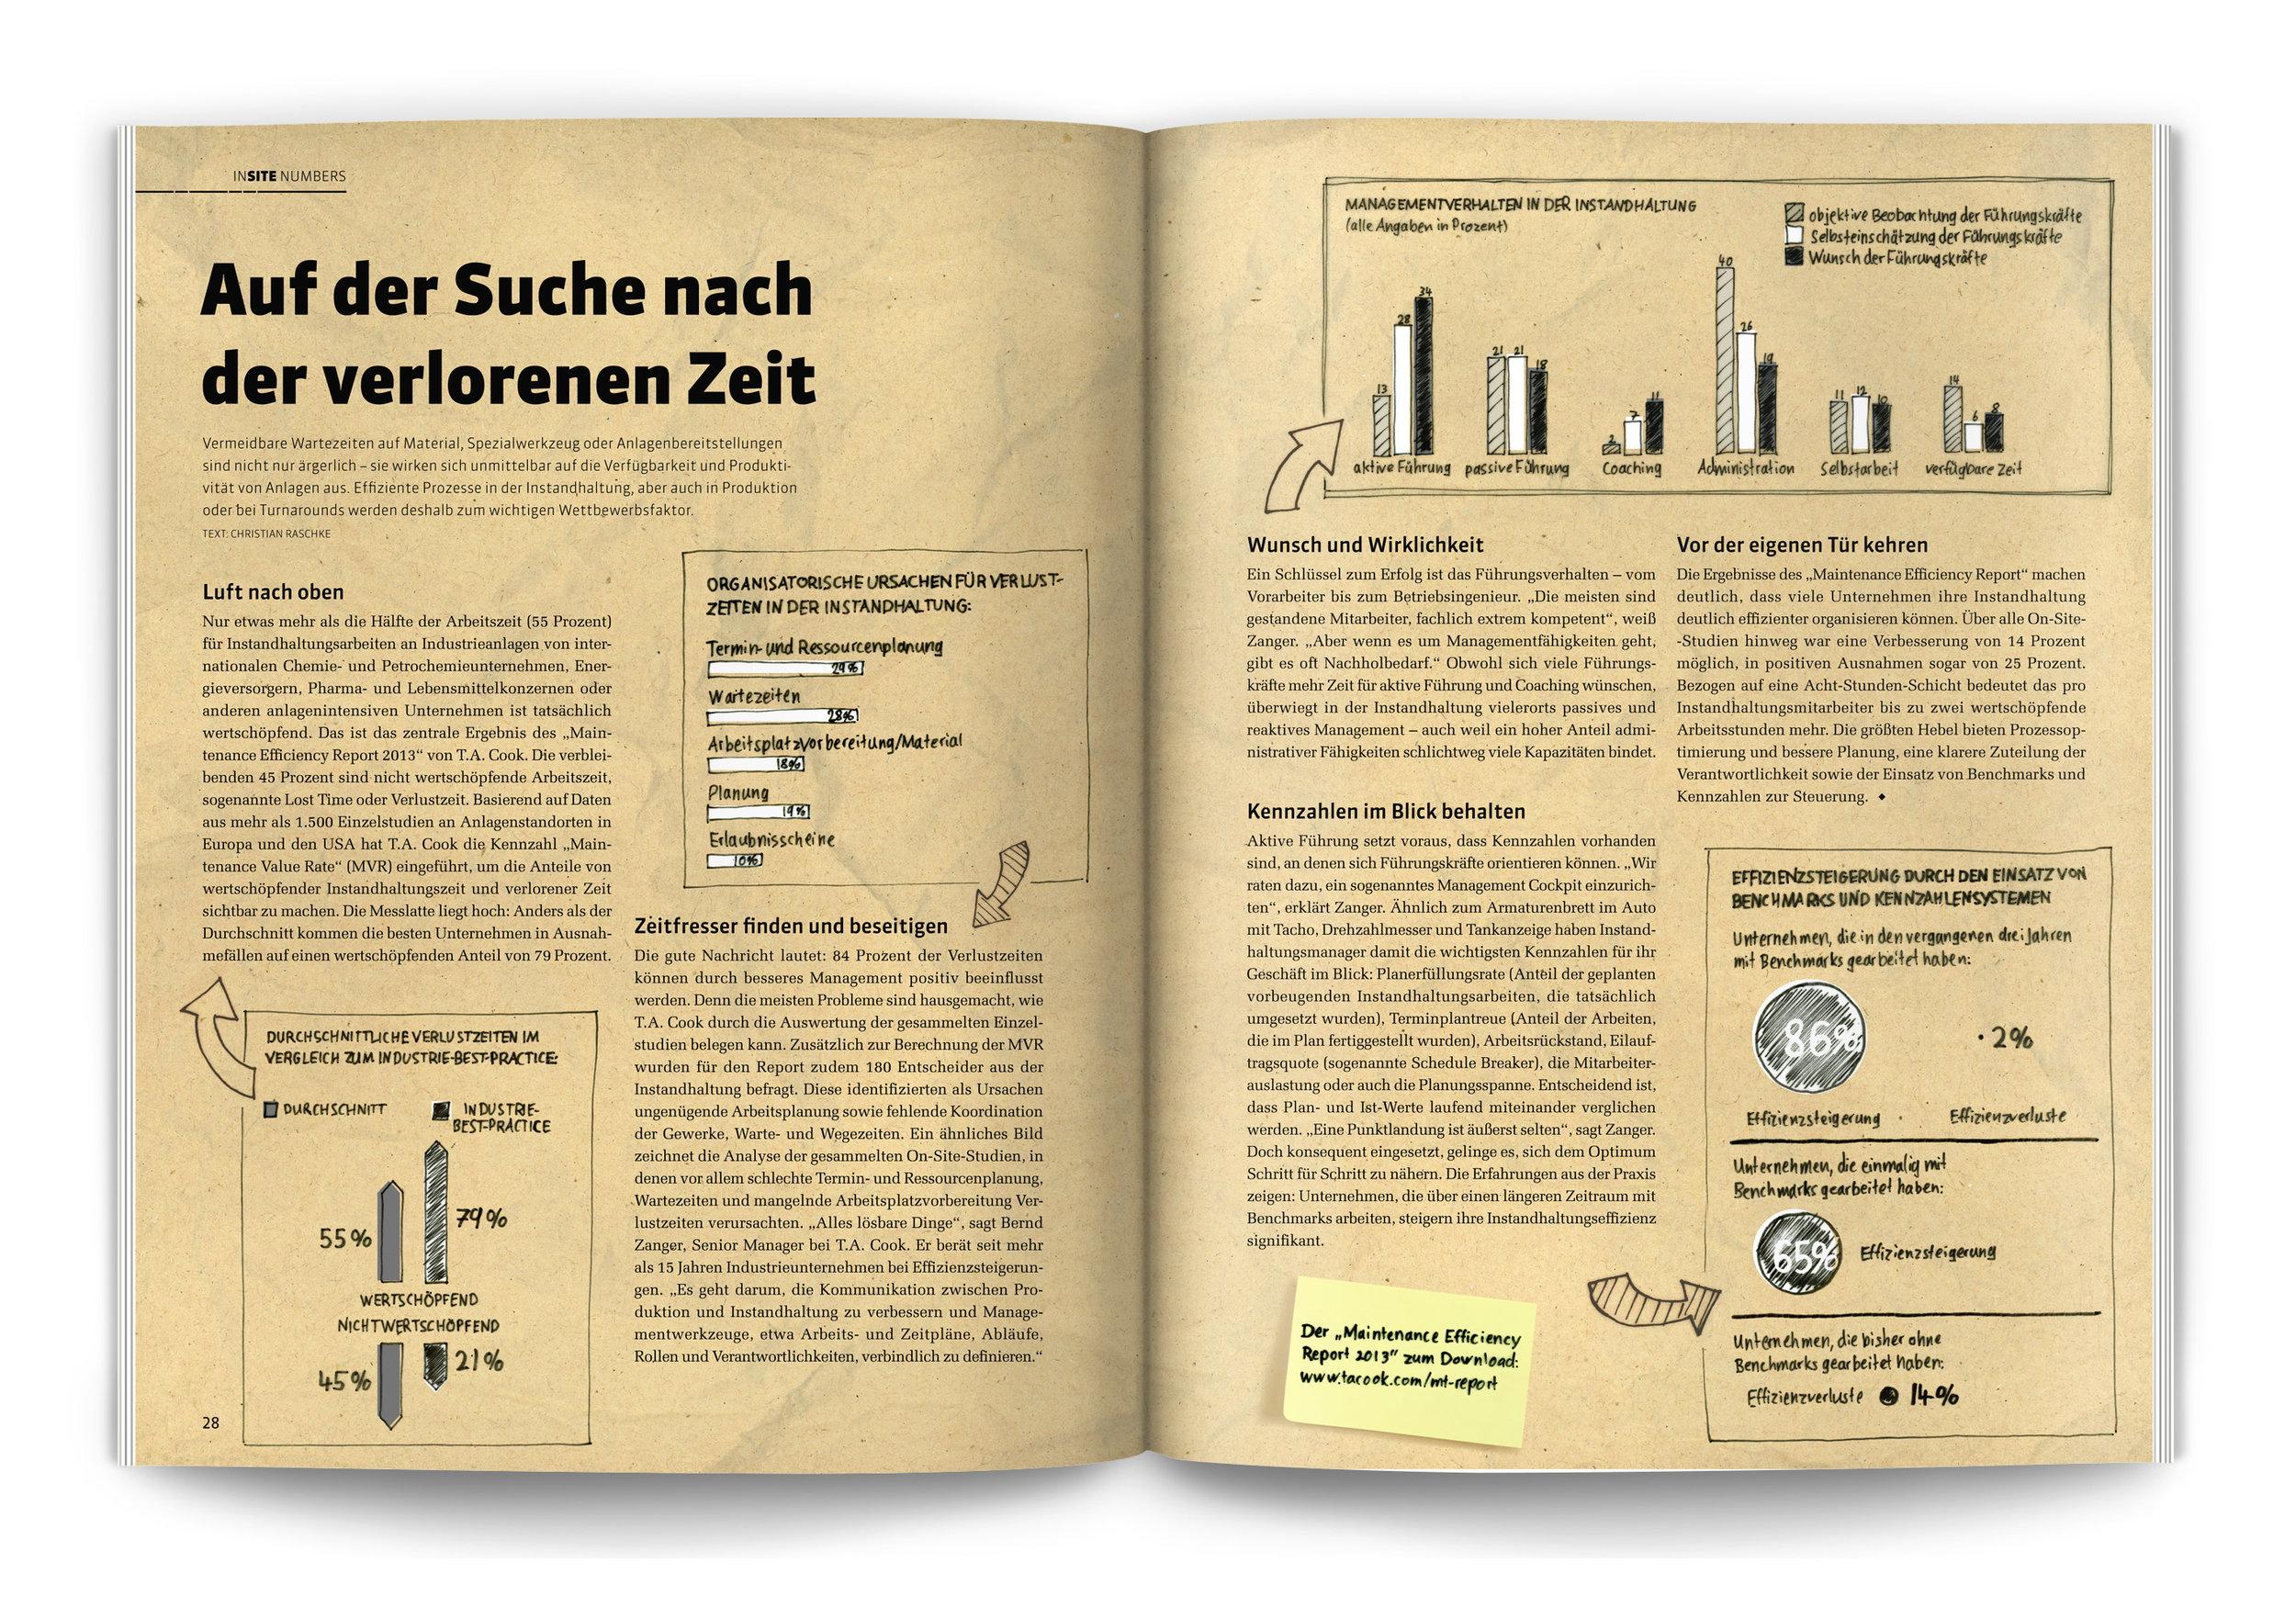 11_Josekdesign_INSITE_Magazin.jpg